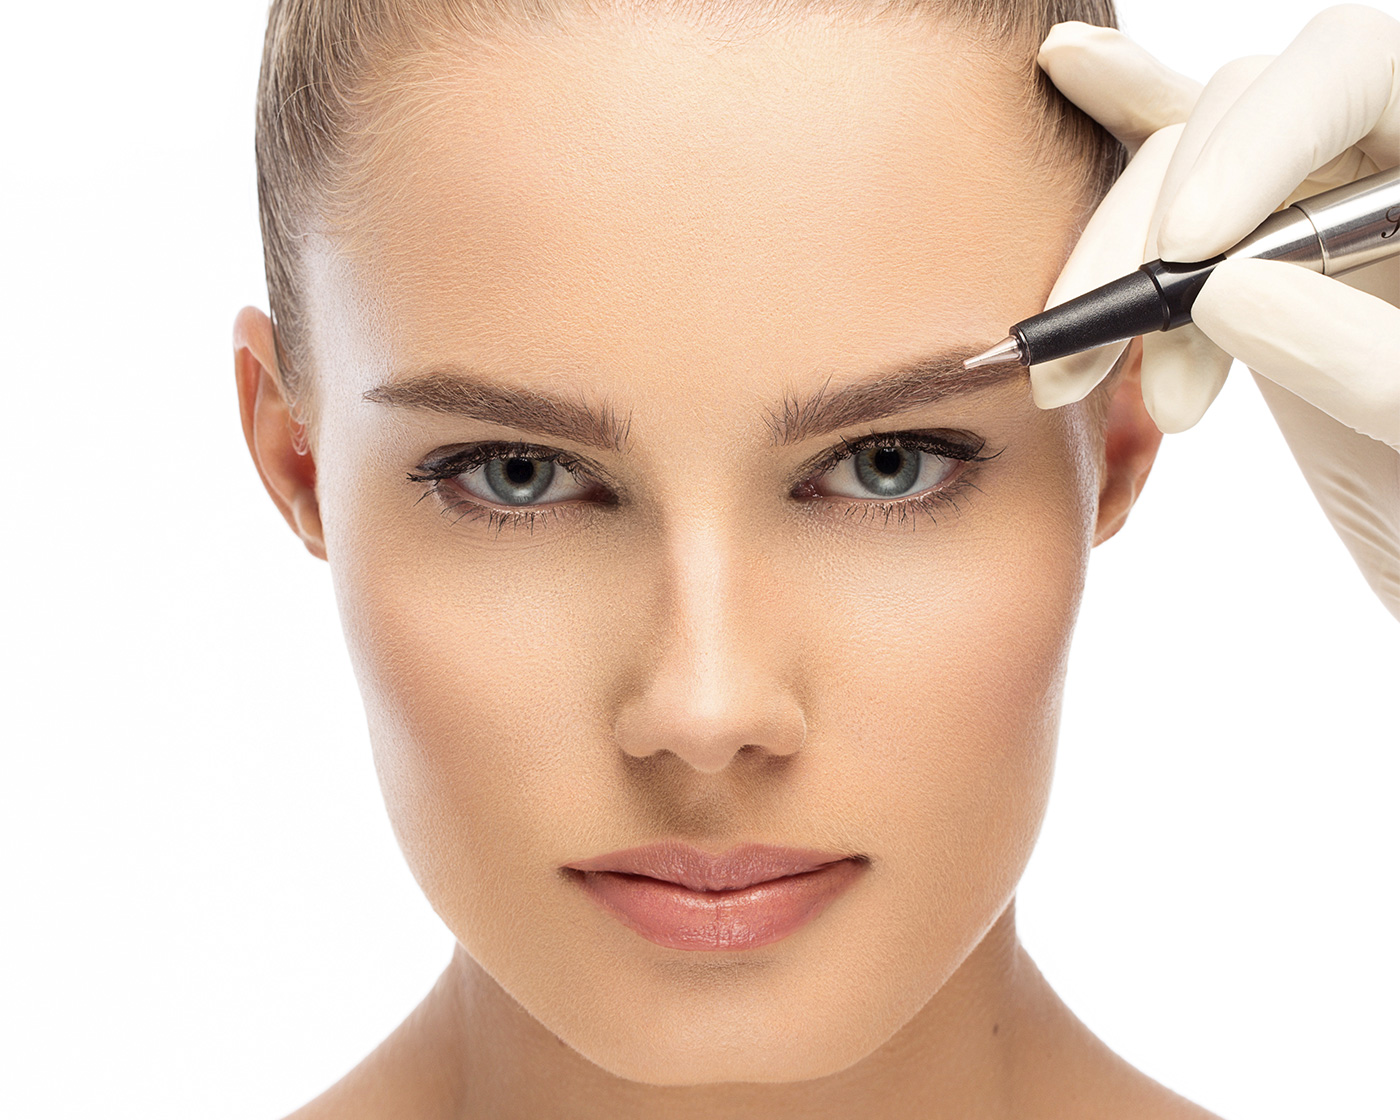 Biotek OFFICIAL WEBSITE | Permanent make up for eyebrows and